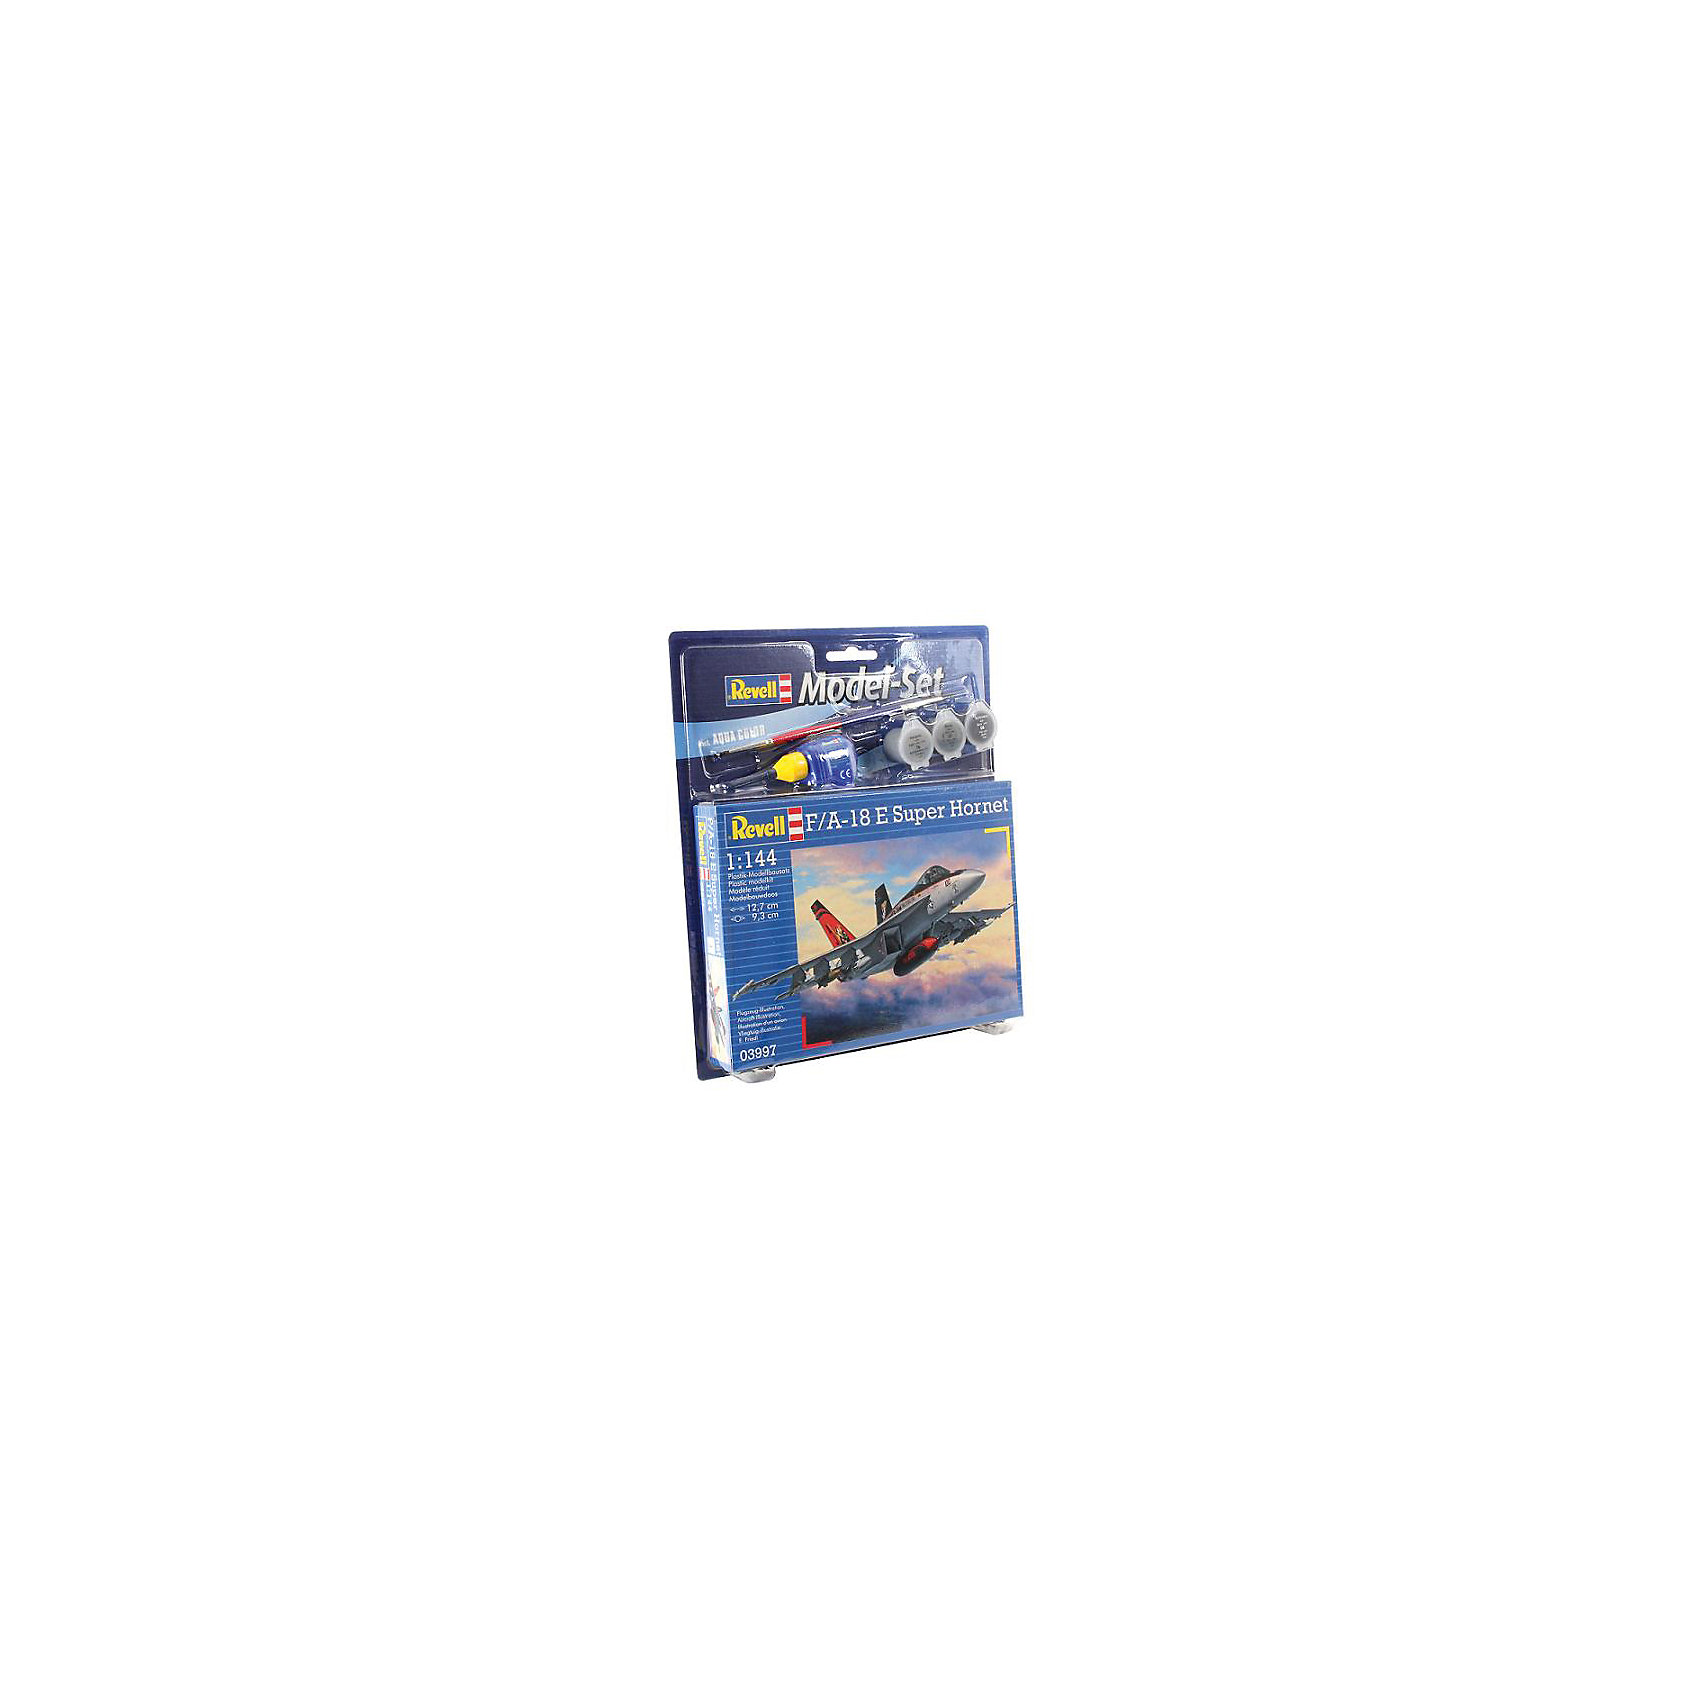 Revell Самолет Истребитель-бомбардировщик Боинг «Супер Хорнет», Revell самолеты и вертолеты revell набор со сборной моделью истребитель dassault rafale m